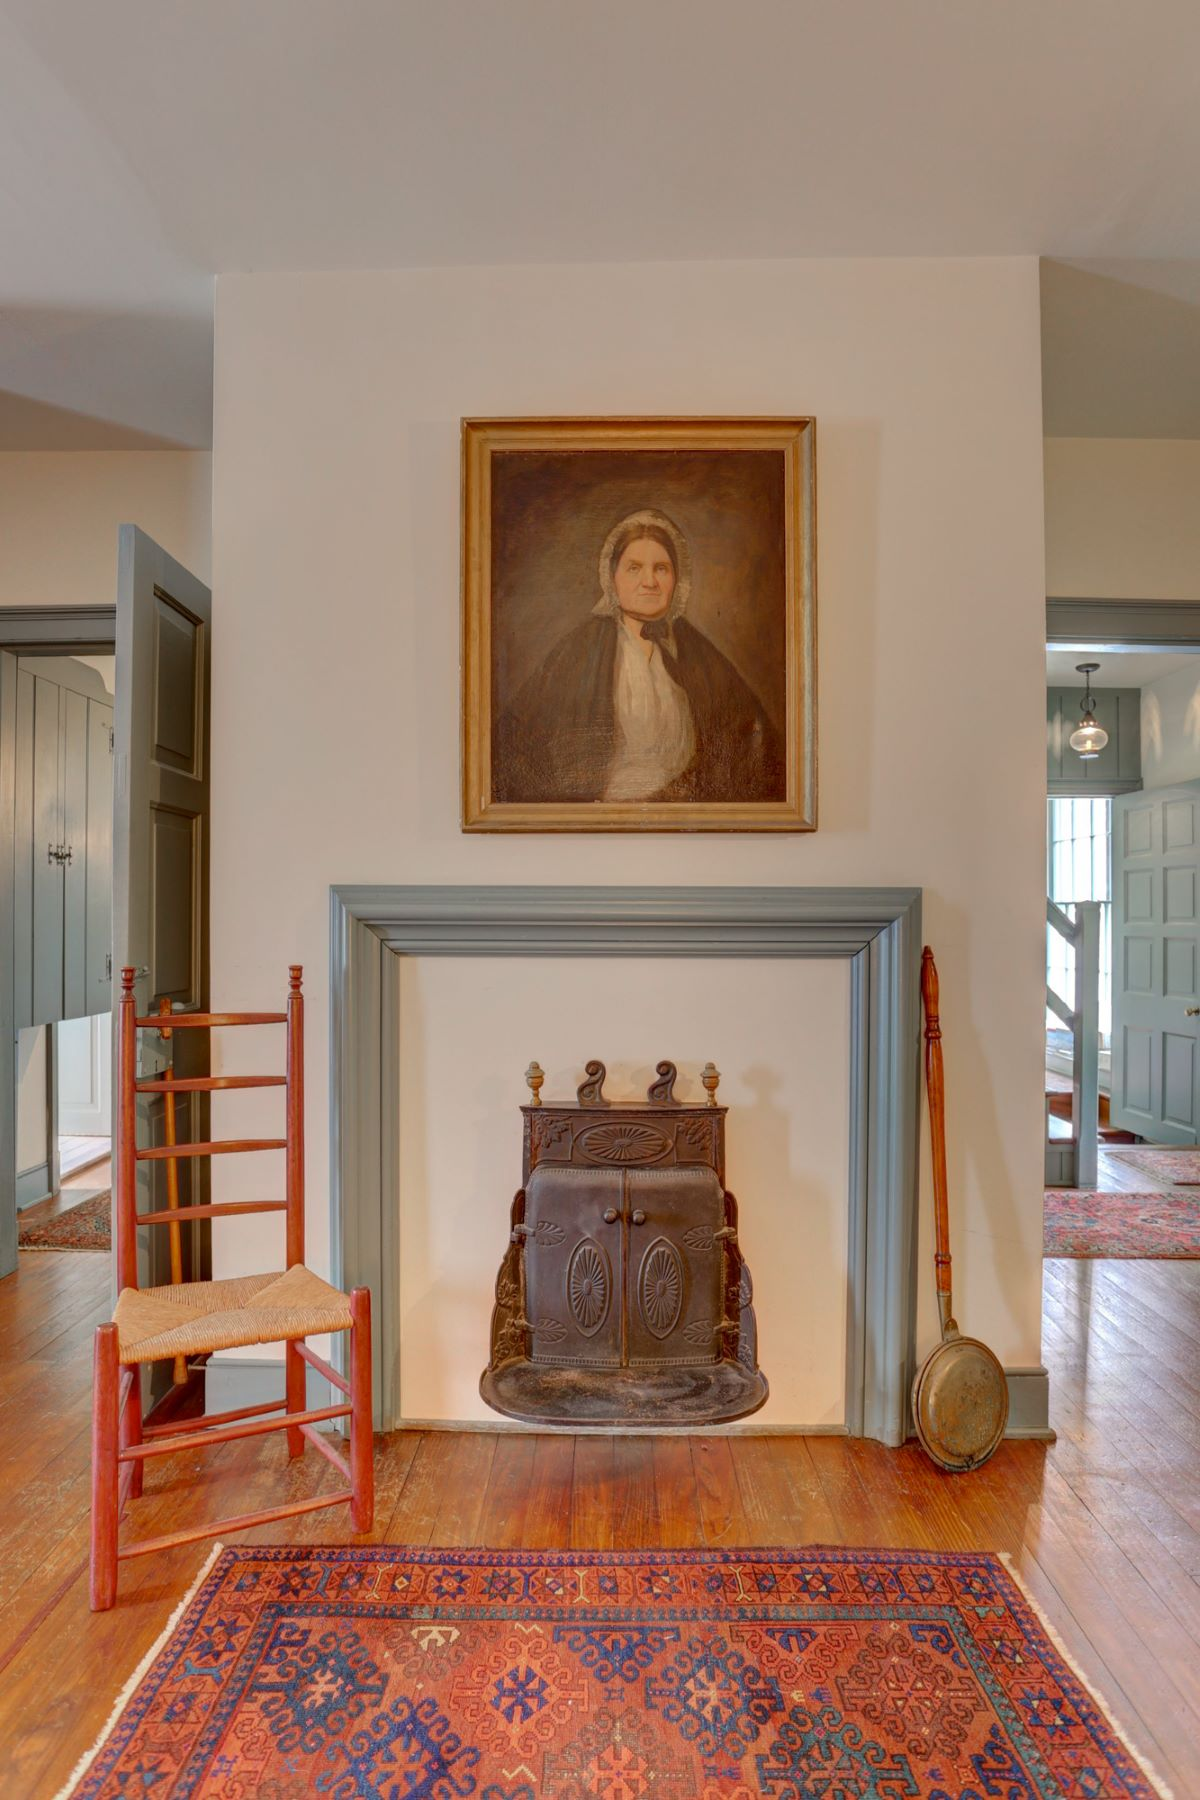 Additional photo for property listing at 121 E Main Street 121 E Main Street Lititz, Pennsylvania 17543 United States